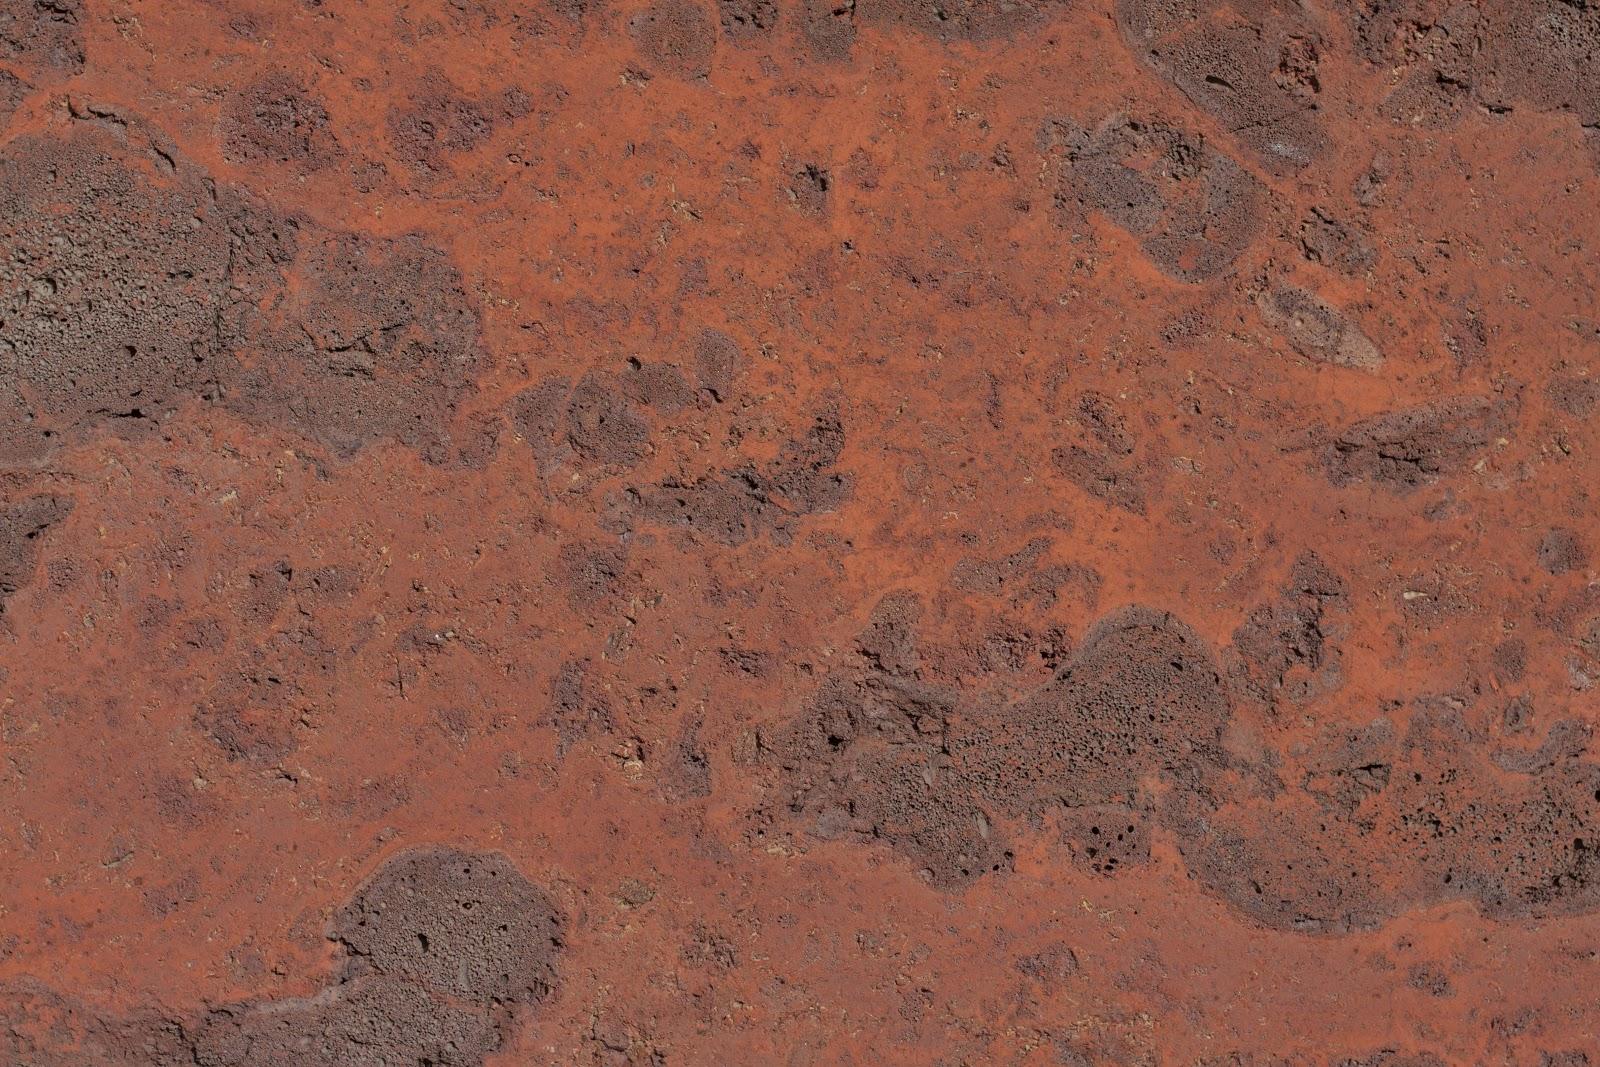 stone tile texture. Stone tile texture High Resolution Seamless Textures